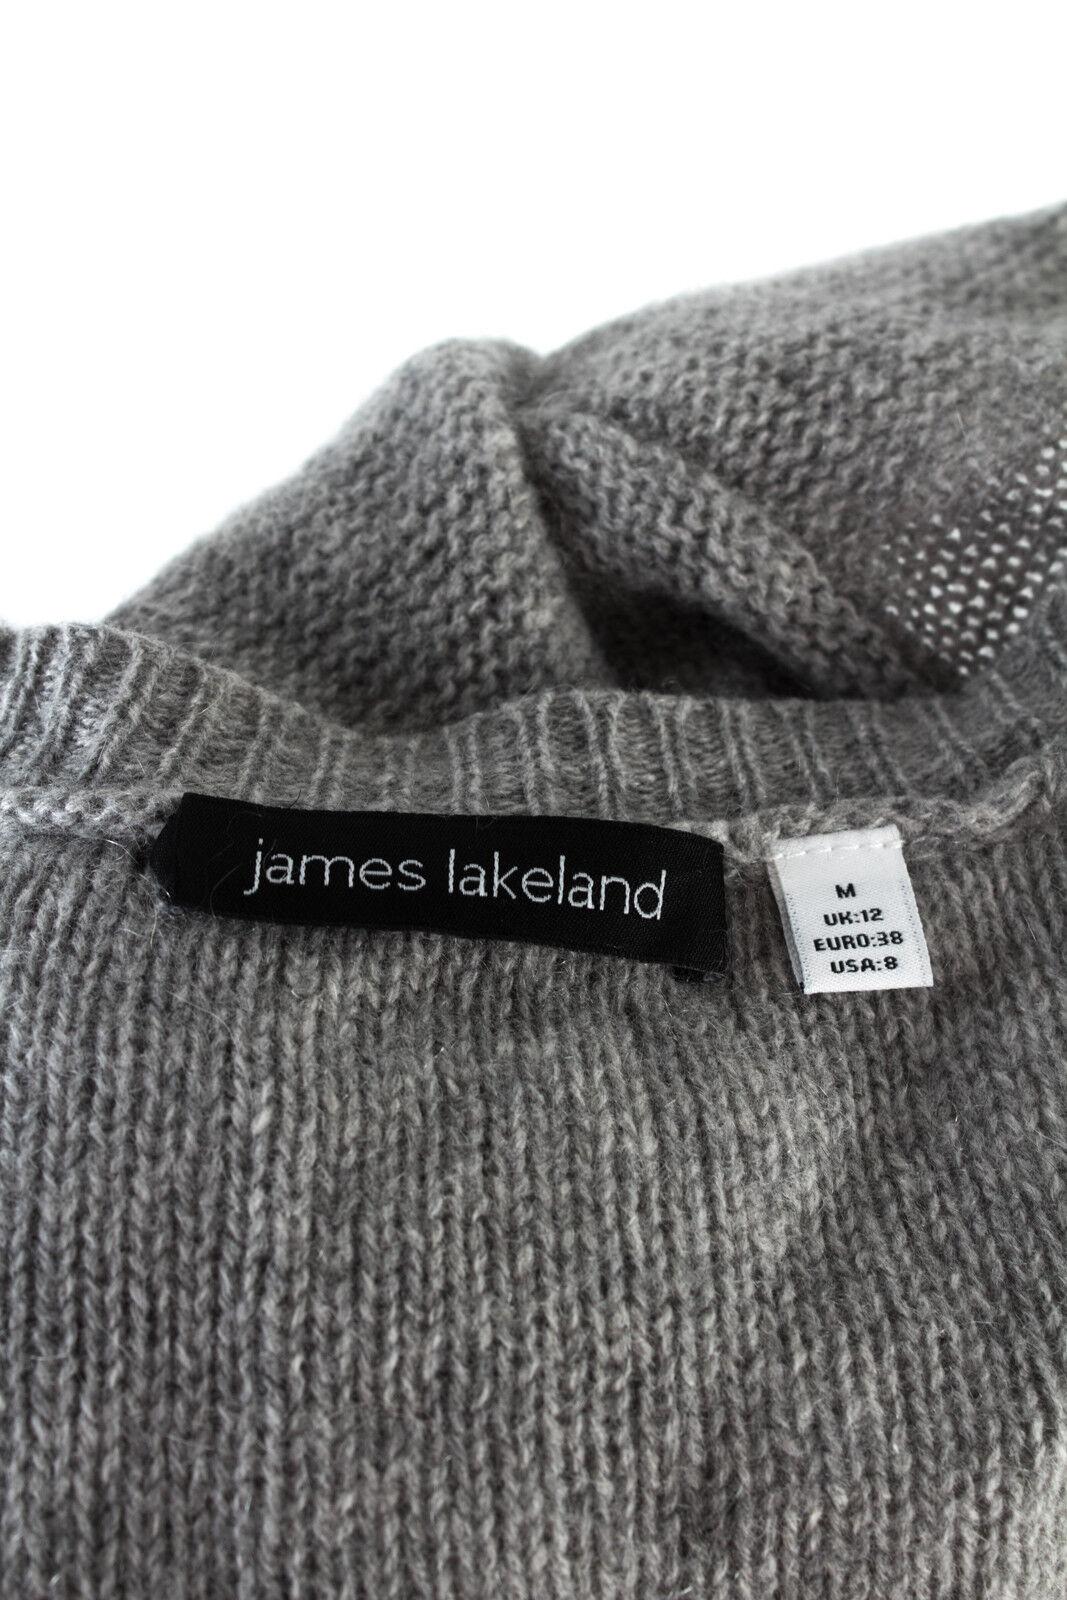 James Lakeland Giacca Giacca Giacca A Maglia Tg 38 CASHMERE CARDIGAN ASIMMETRICO MAGLIA JACKET be9602